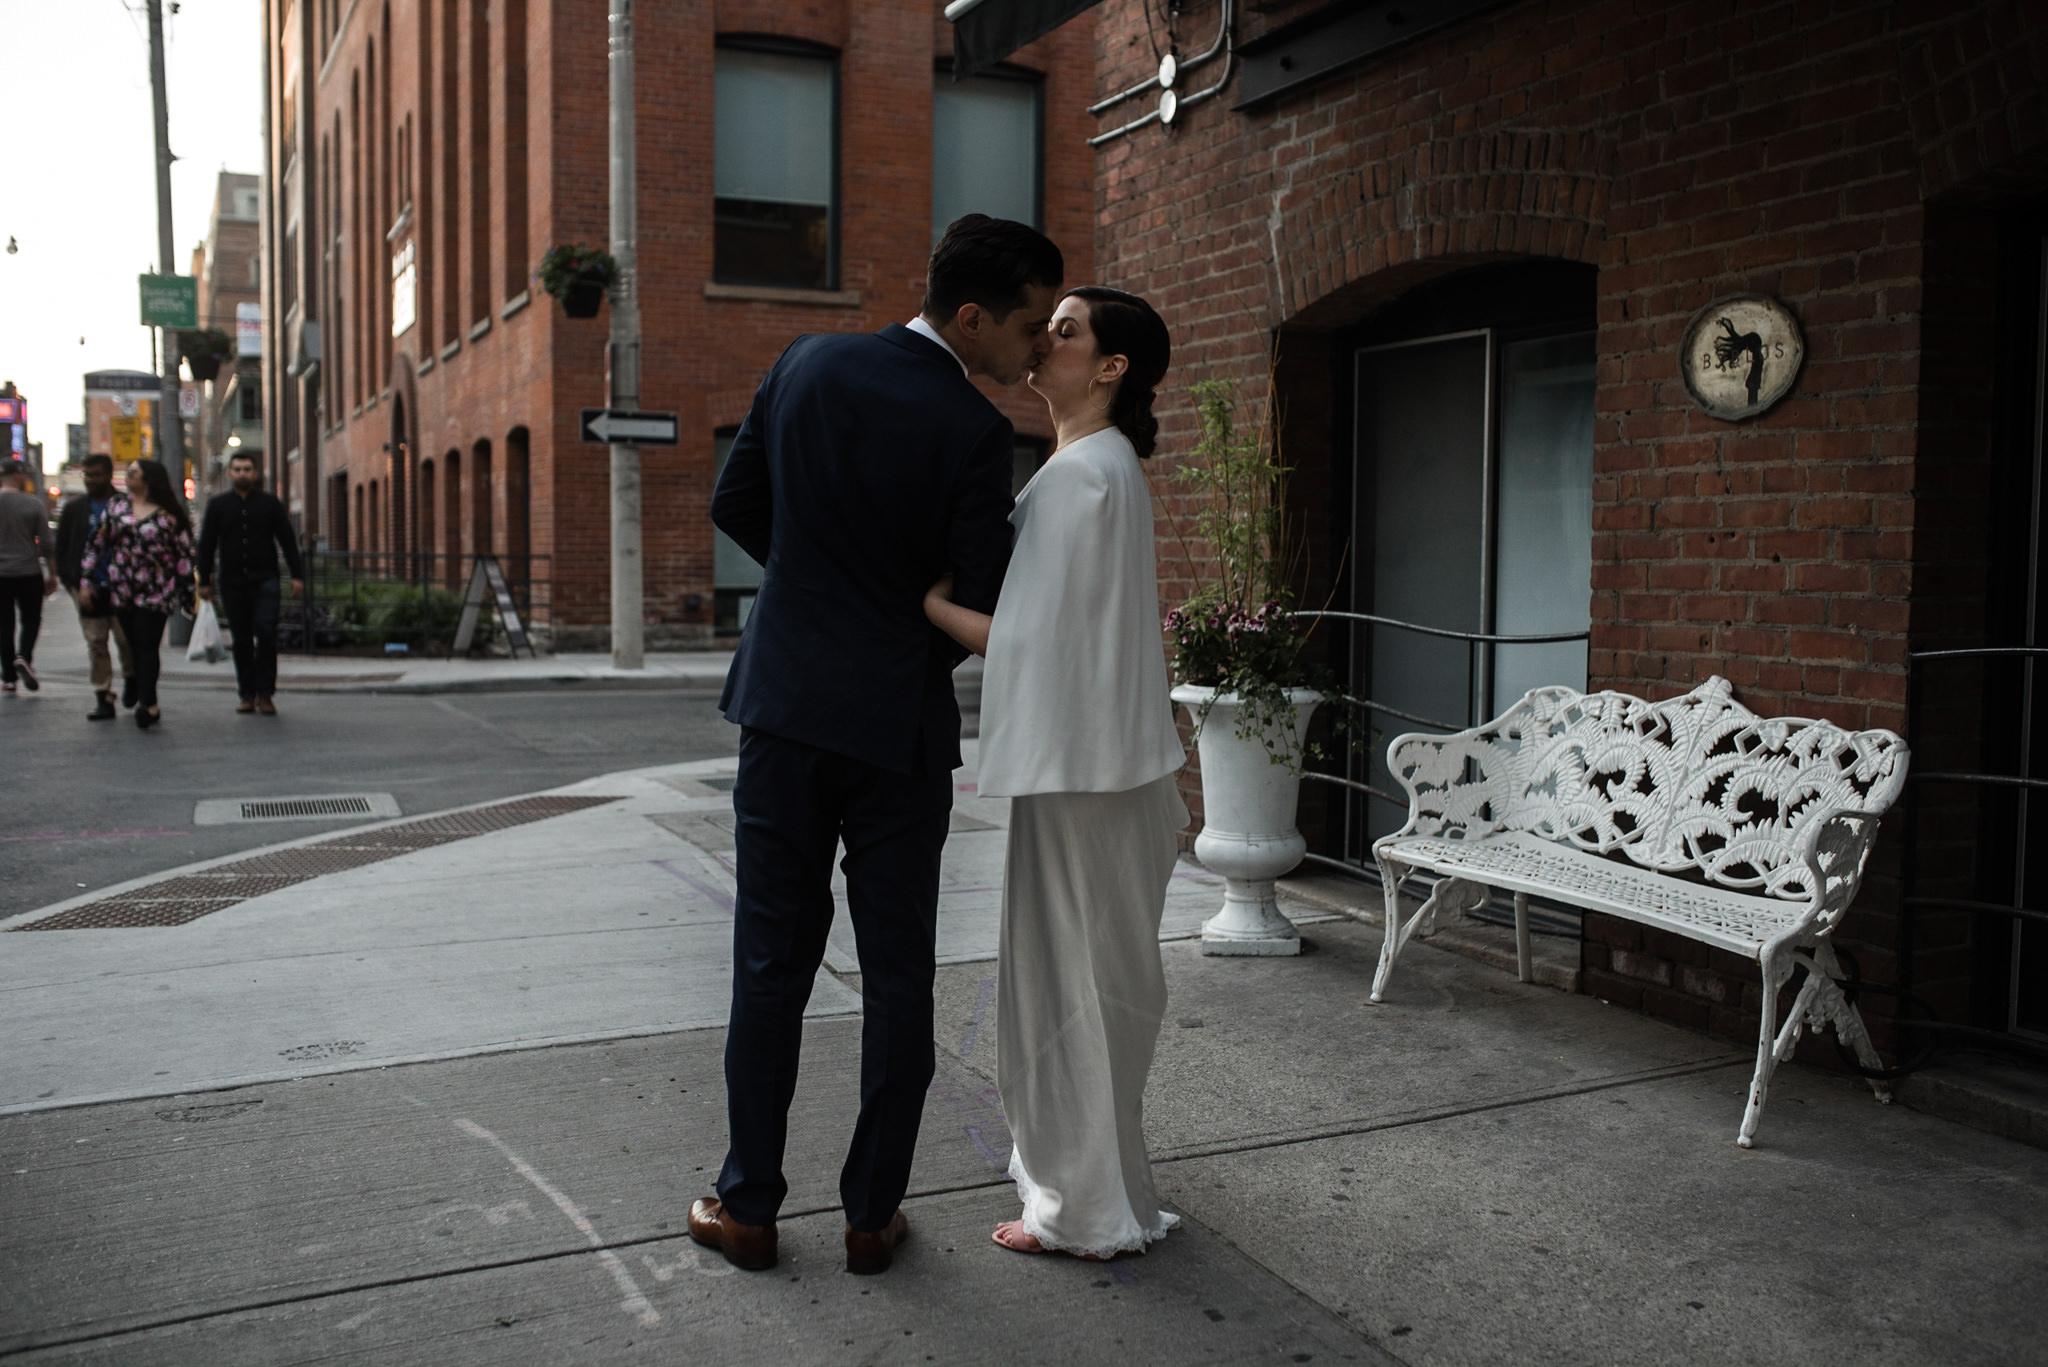 065-loversland-cape-dress-toronto-wedding-modern-chic-couple.jpg